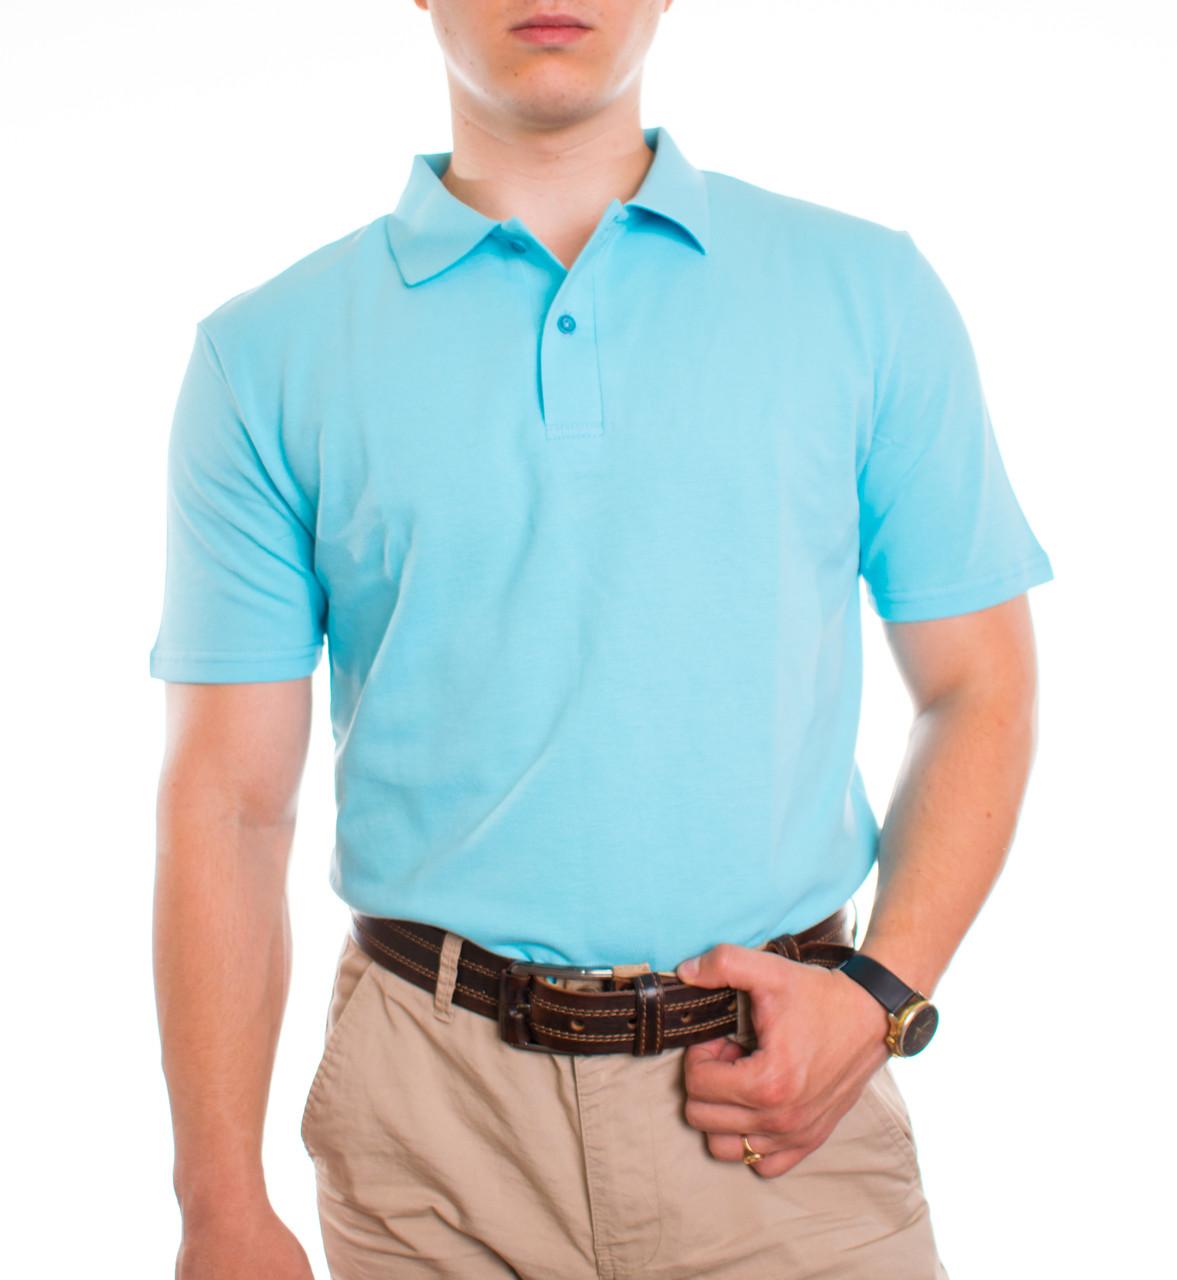 Bono Чоловіча футболка Поло блакитний 400115